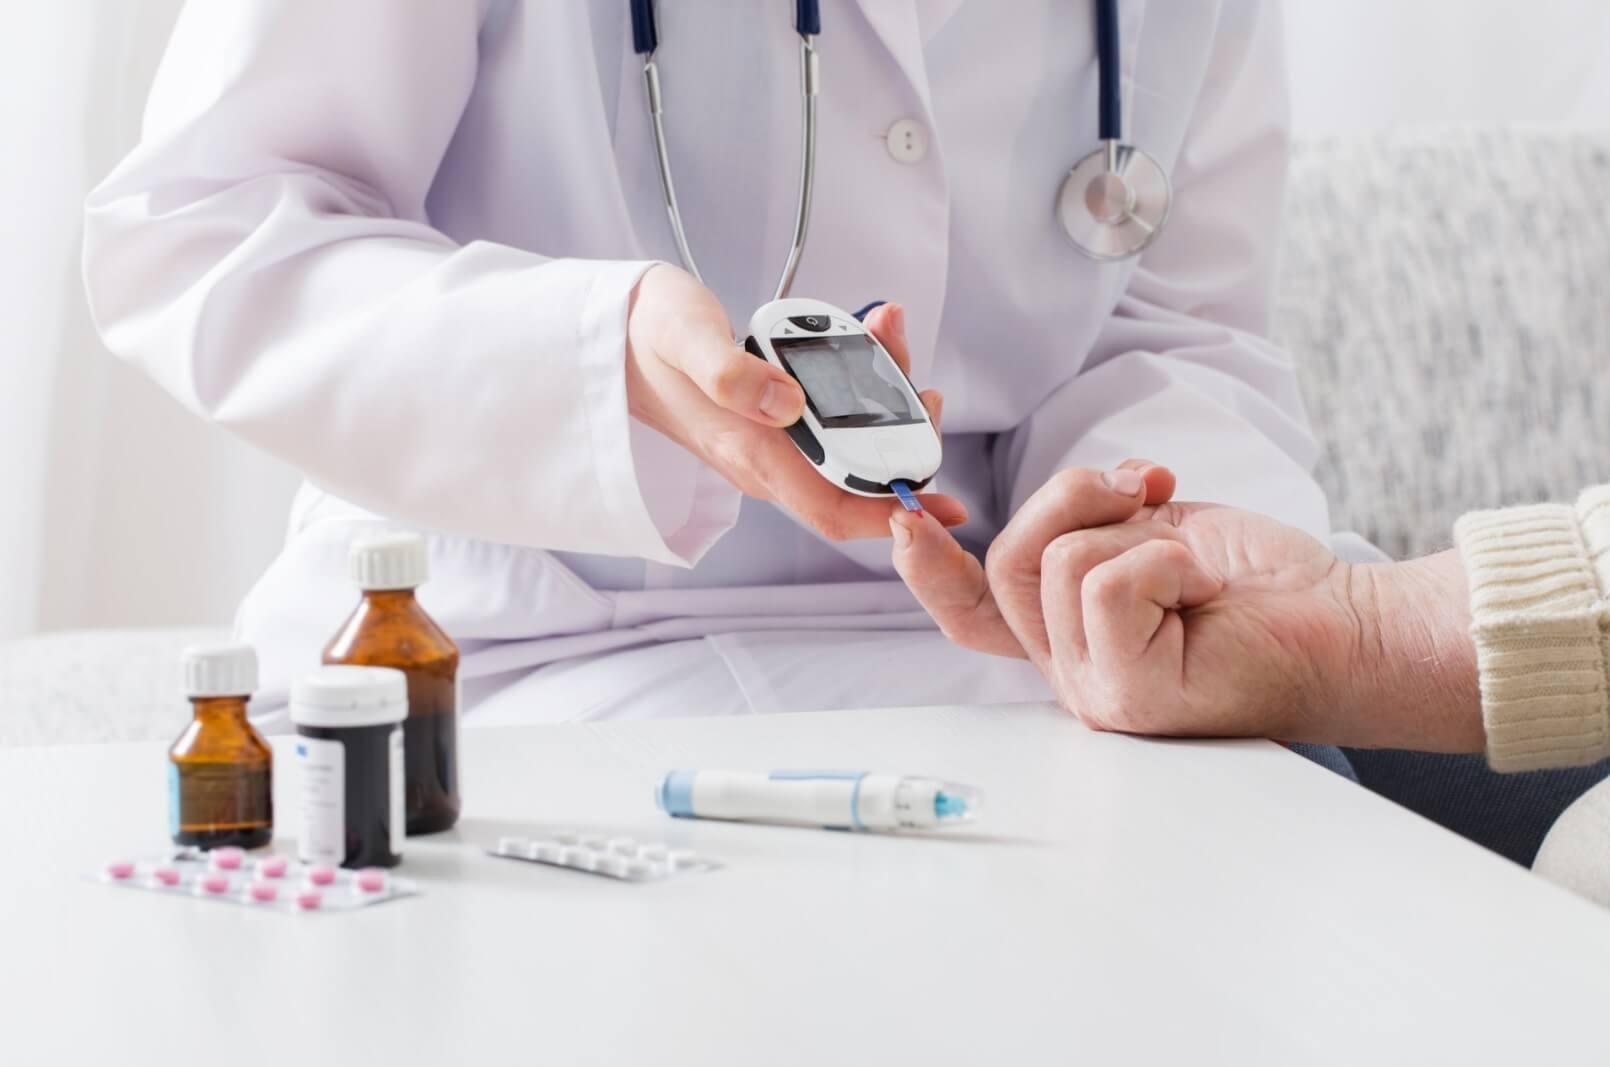 Diabetes And Weight Loss – Blood Sugar And Weight Loss